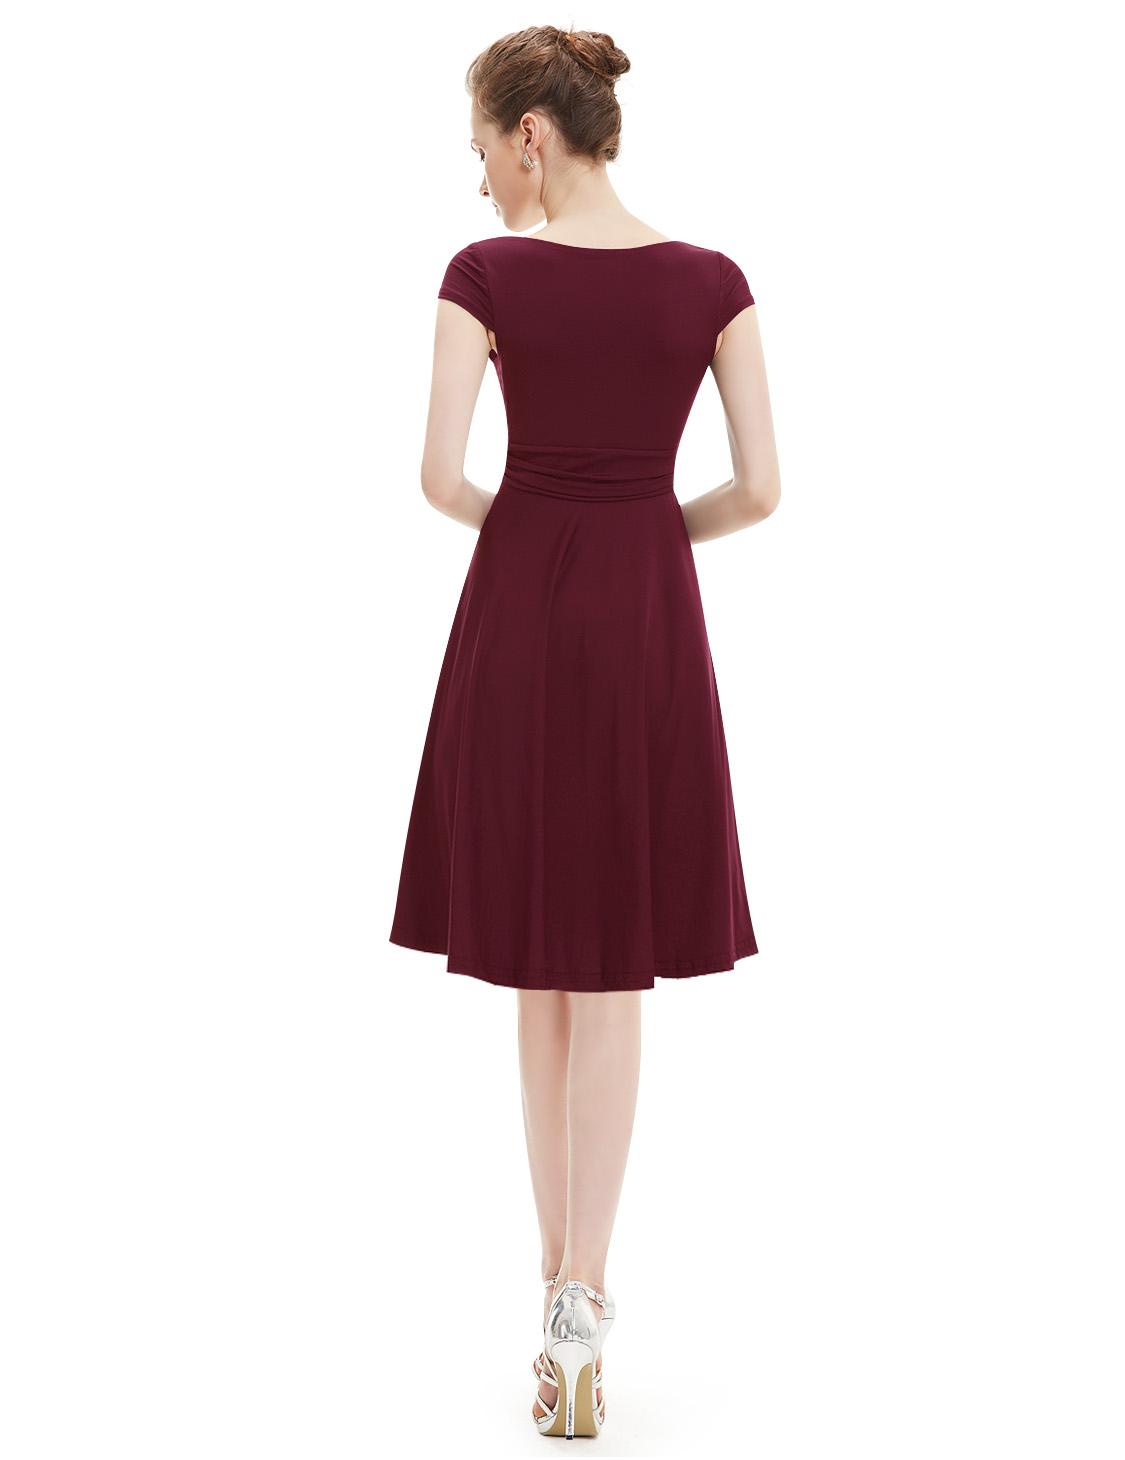 Photos Of Short Casual Dresses